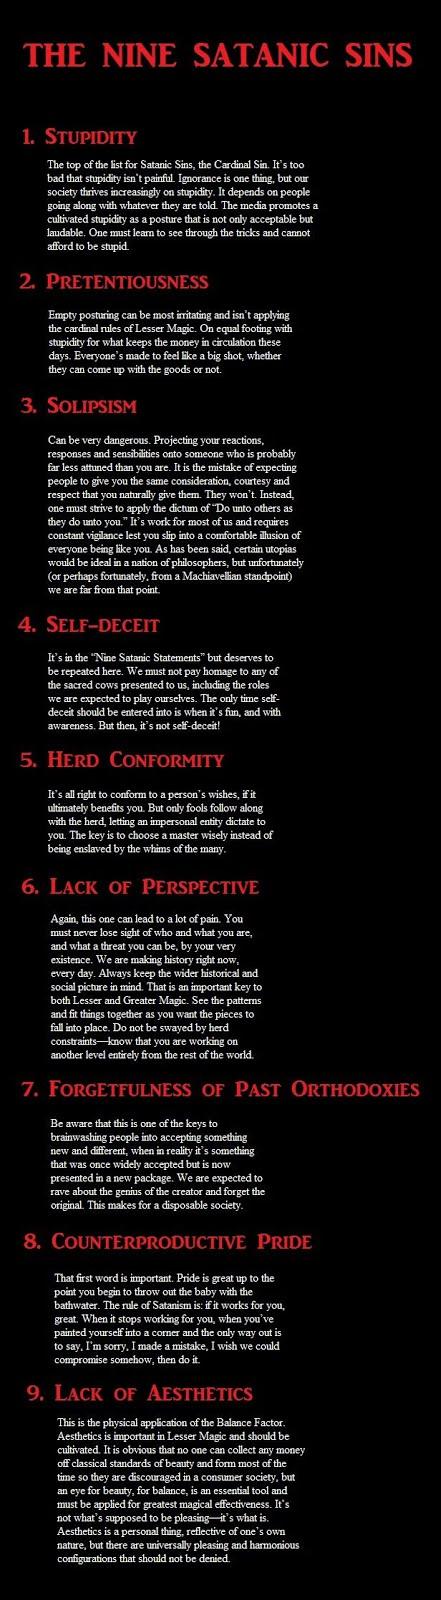 the nine satanic sins